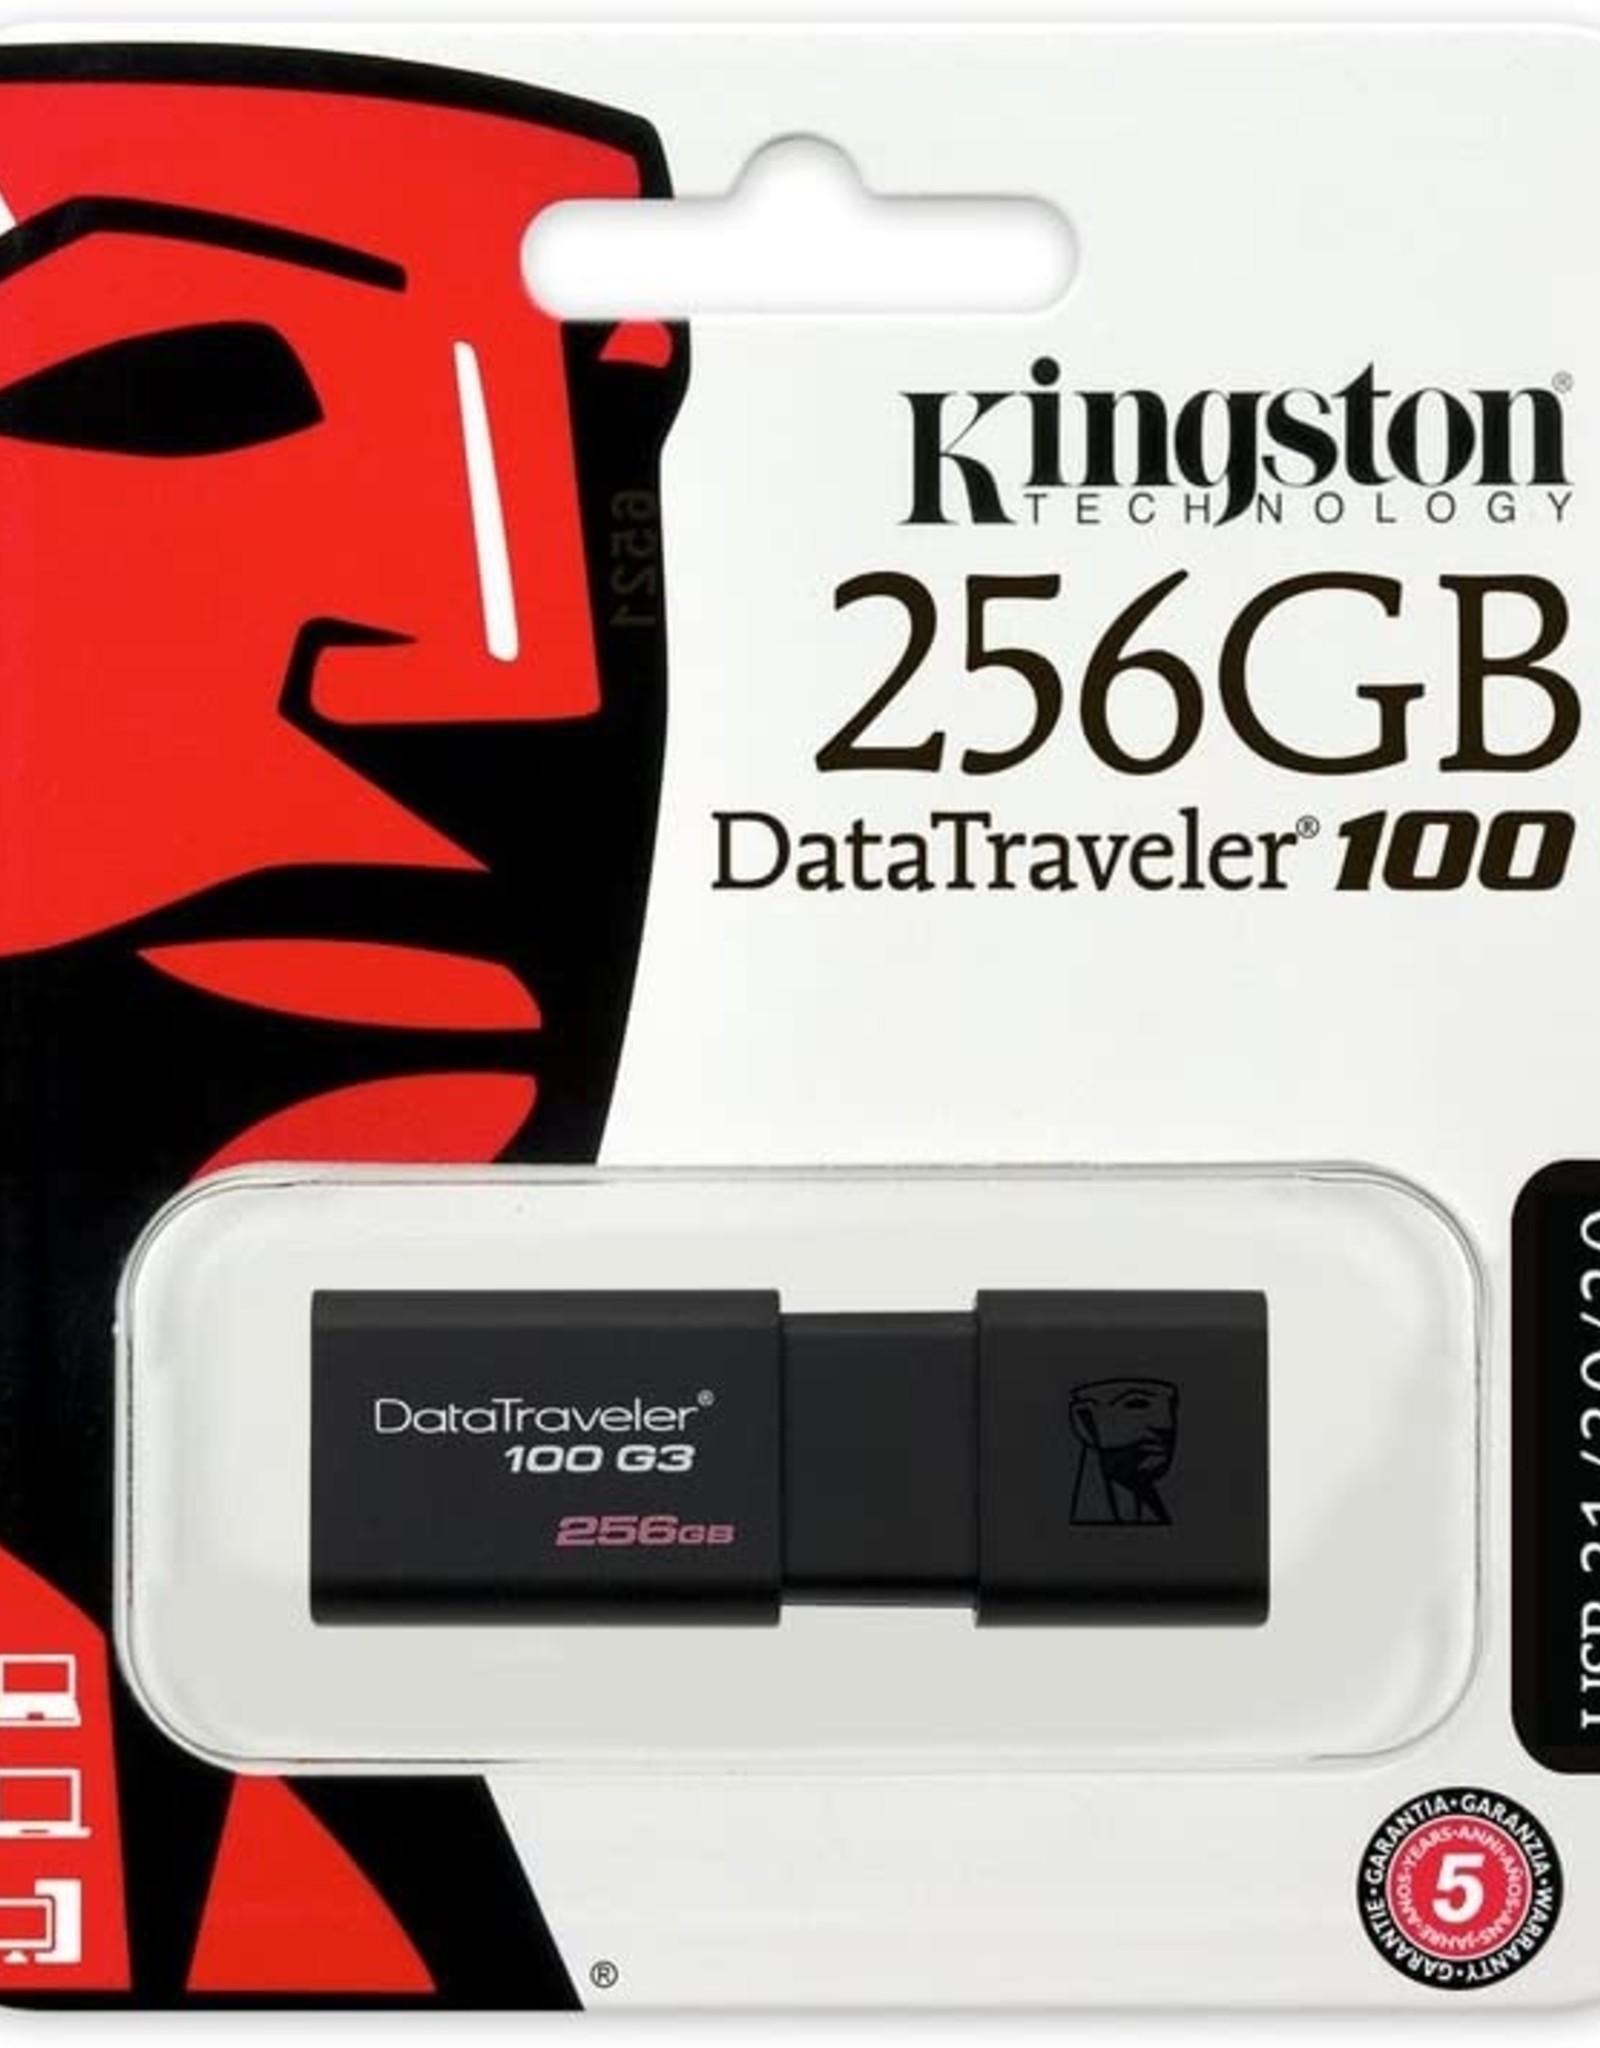 KINGSTON KINGSTON DATATRAVELER 100 G3 256GB USB 3.0 FLASH DRIVE